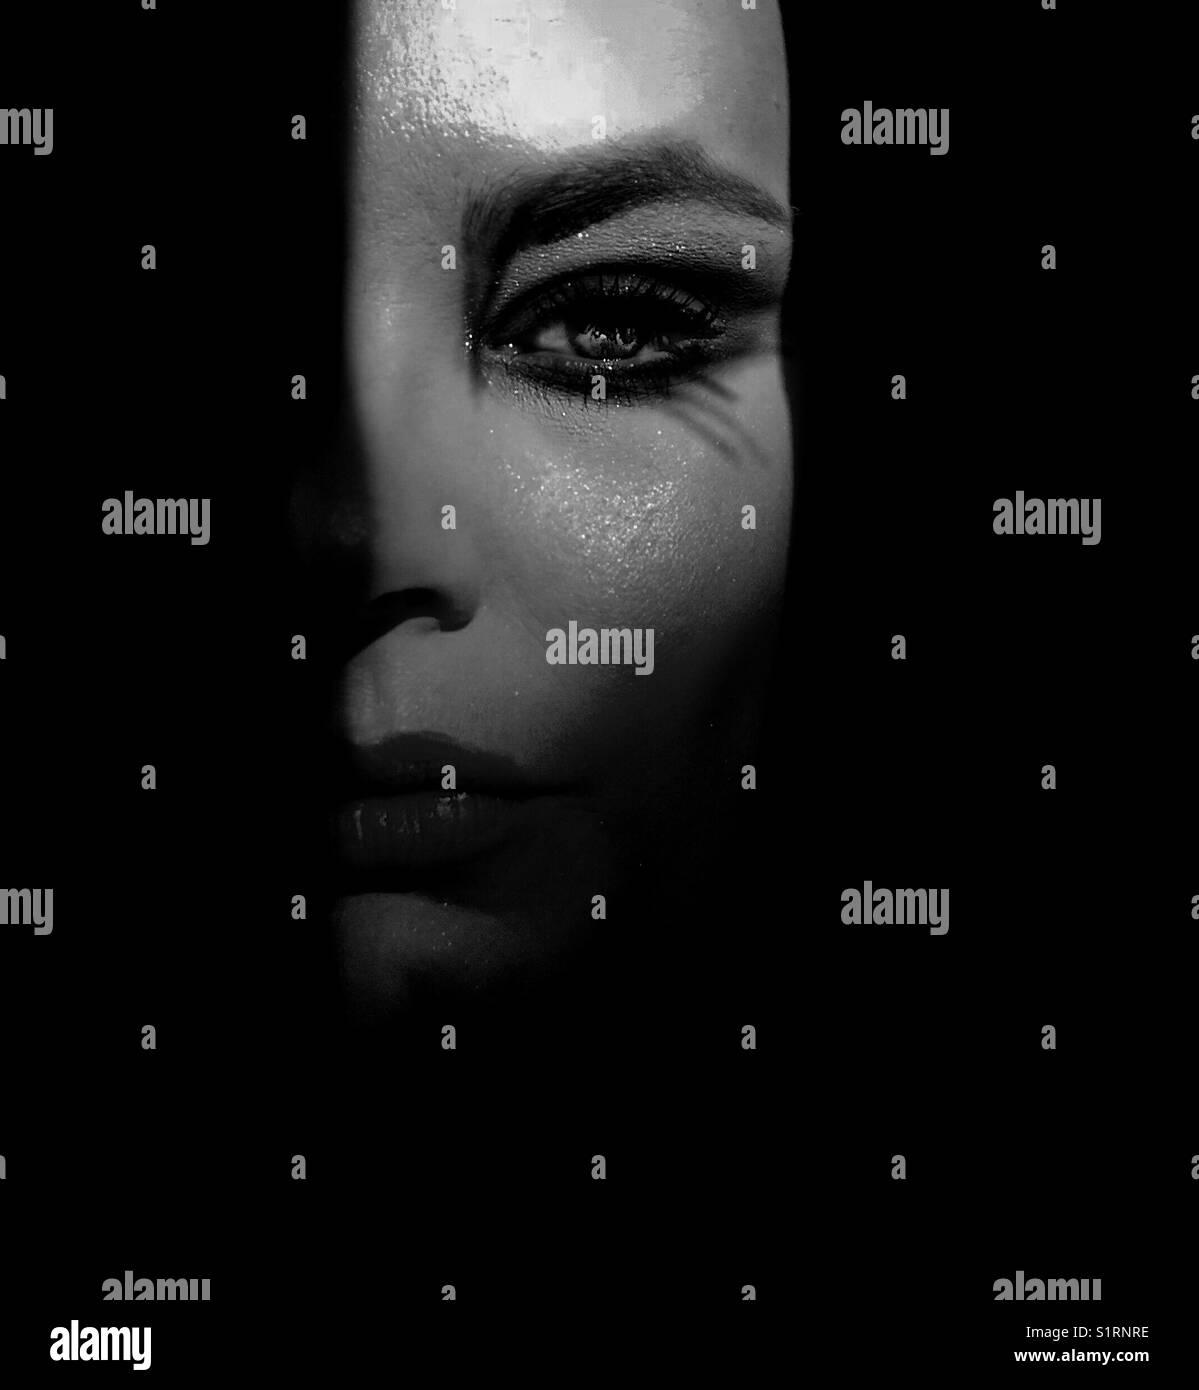 Darkness - Stock Image